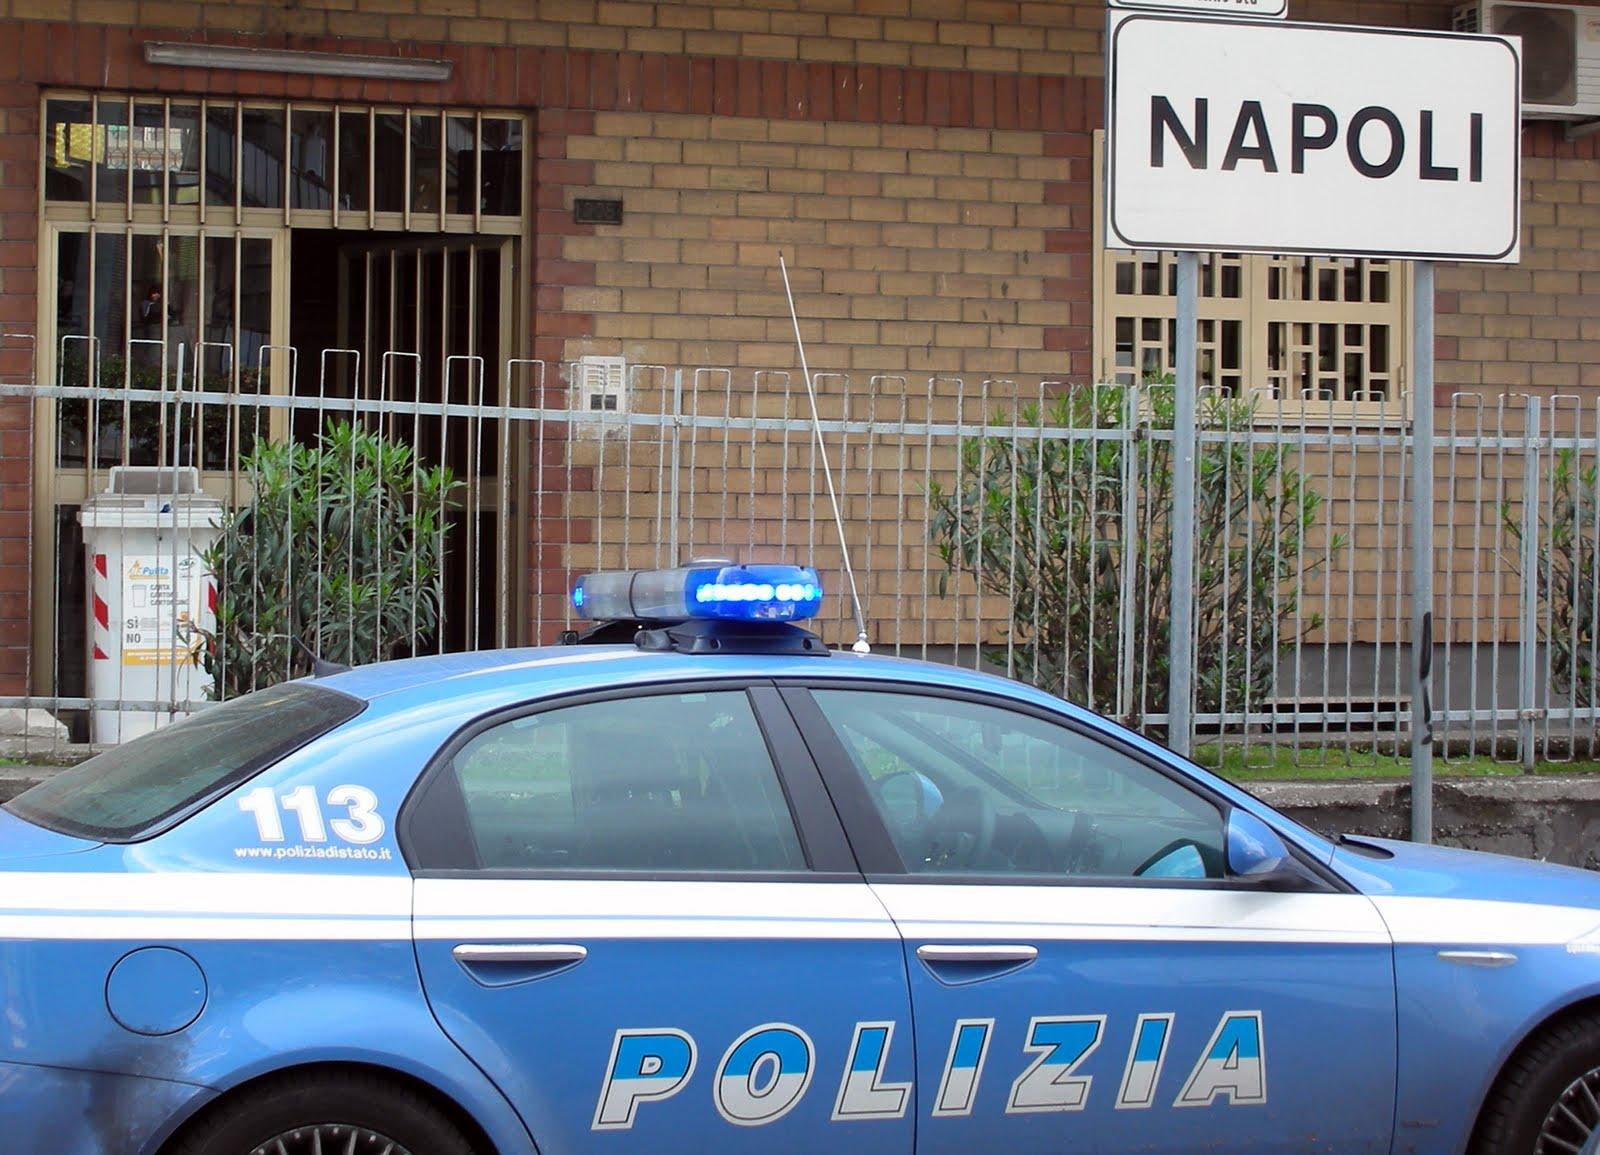 Napoli, Honda Sh travolge agente